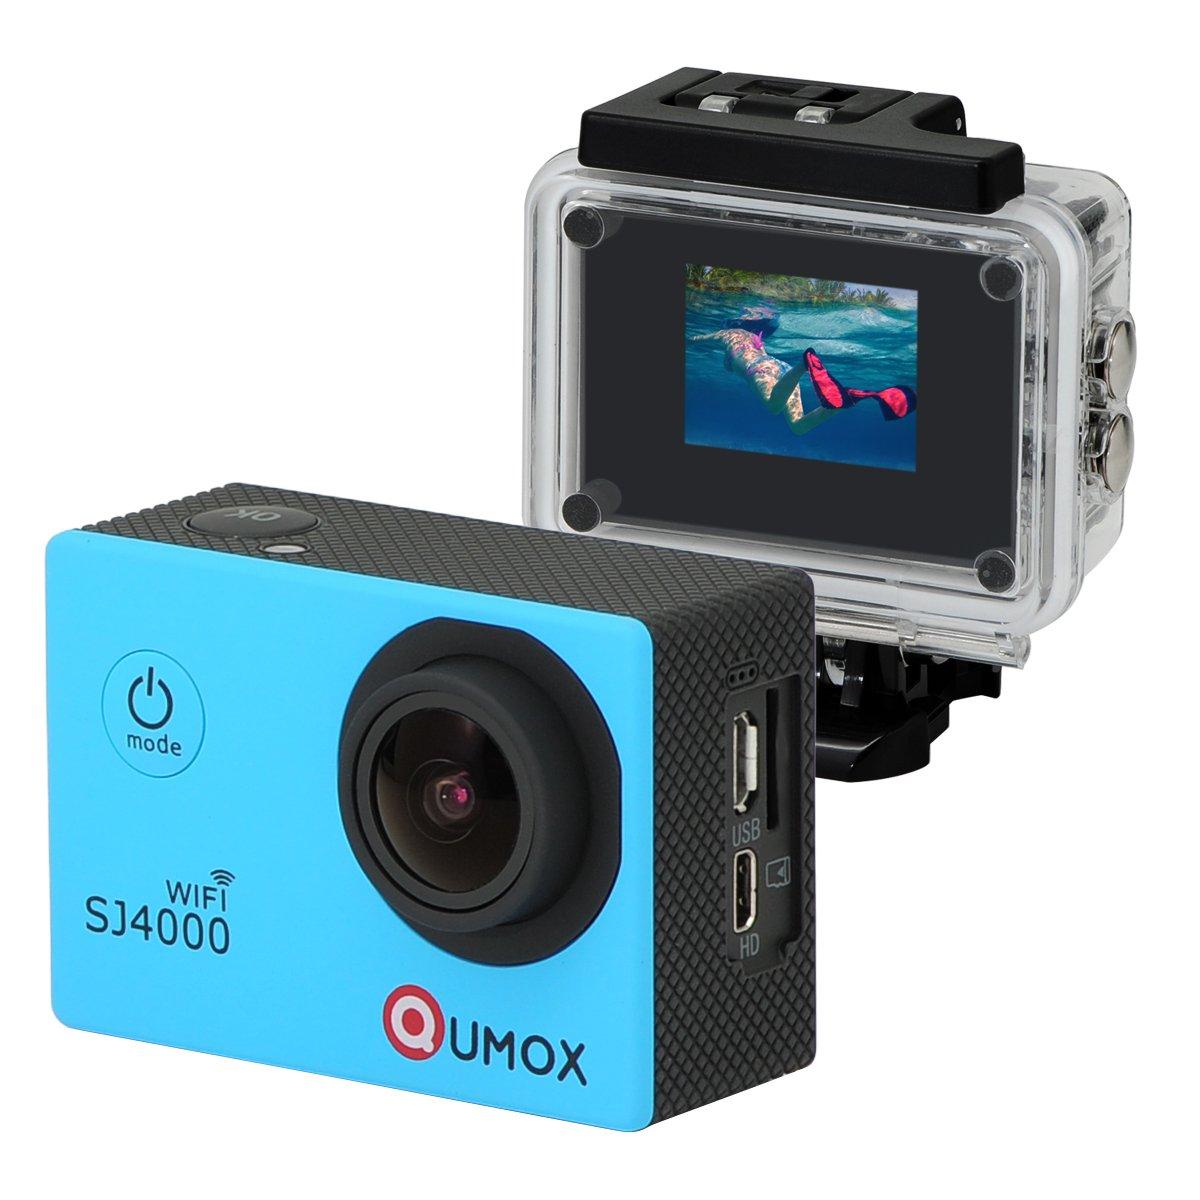 QUMOX WIFI Actioncam SJ4000 Action Sport Kamera Camera Waterproof Full HD 1080p Video Helmkamera Wei? Z033U